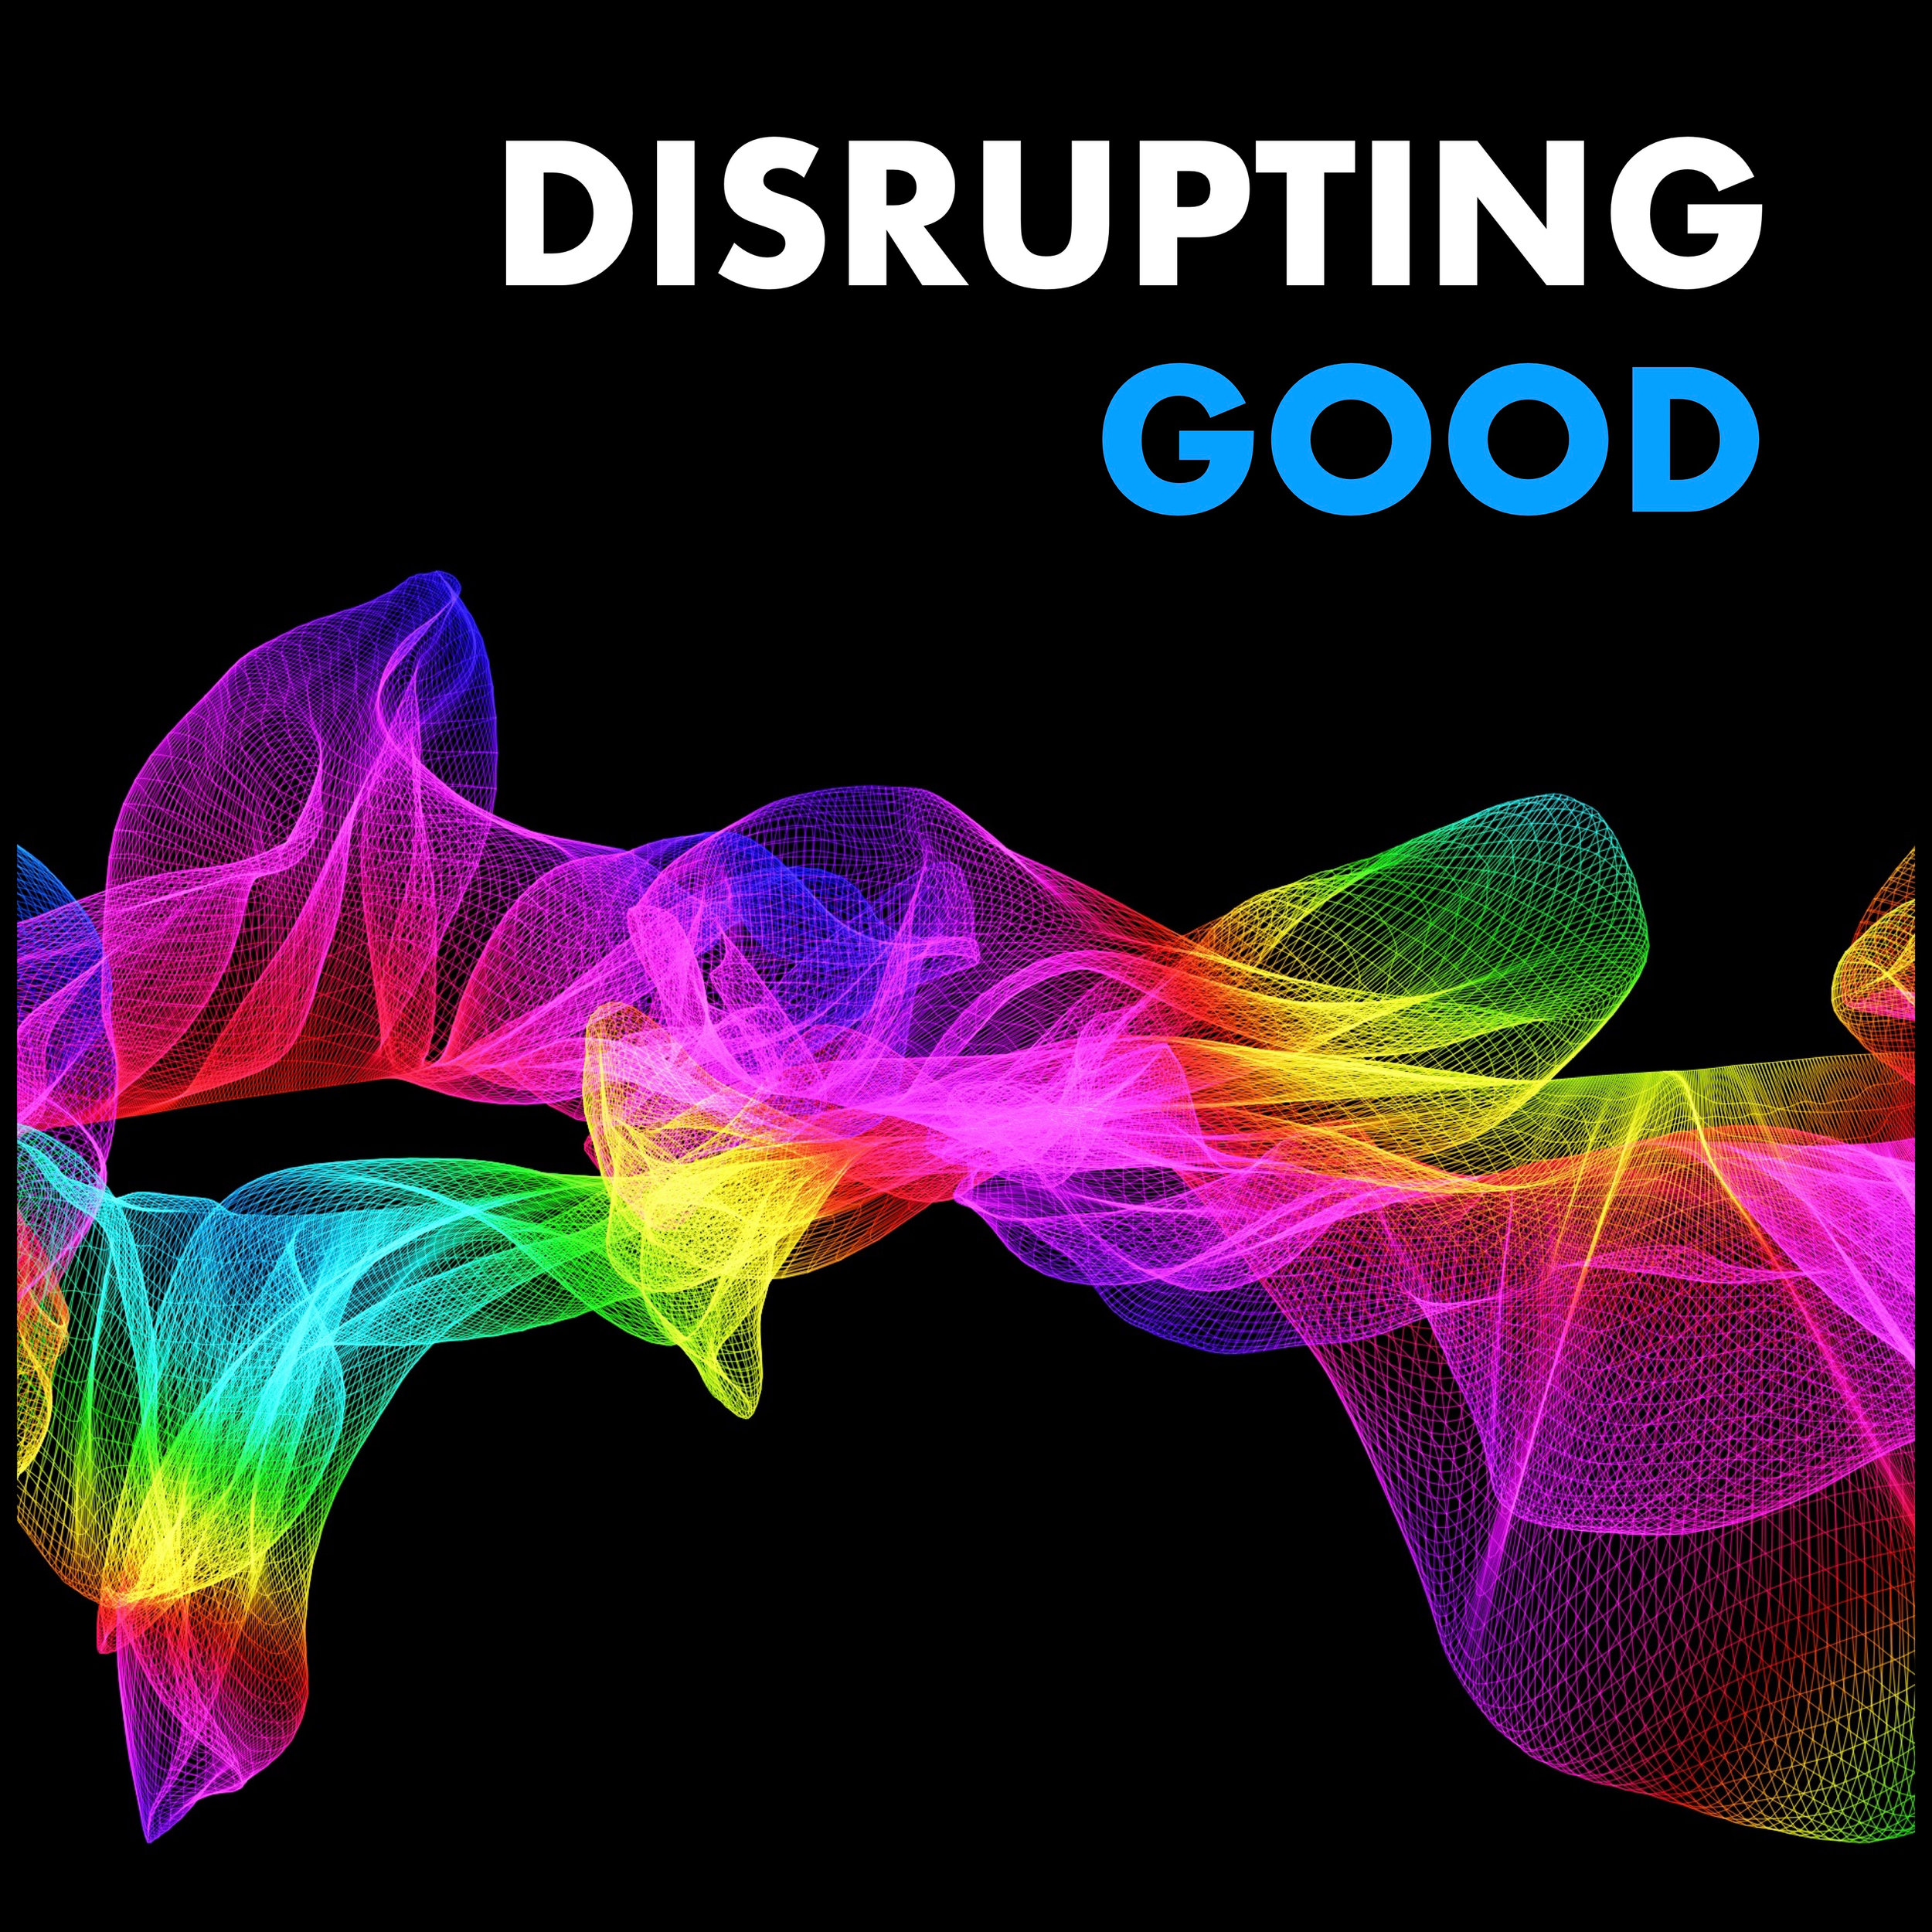 Disrupting Good - Podcast Artwork - Final - 3000x3000.jpg